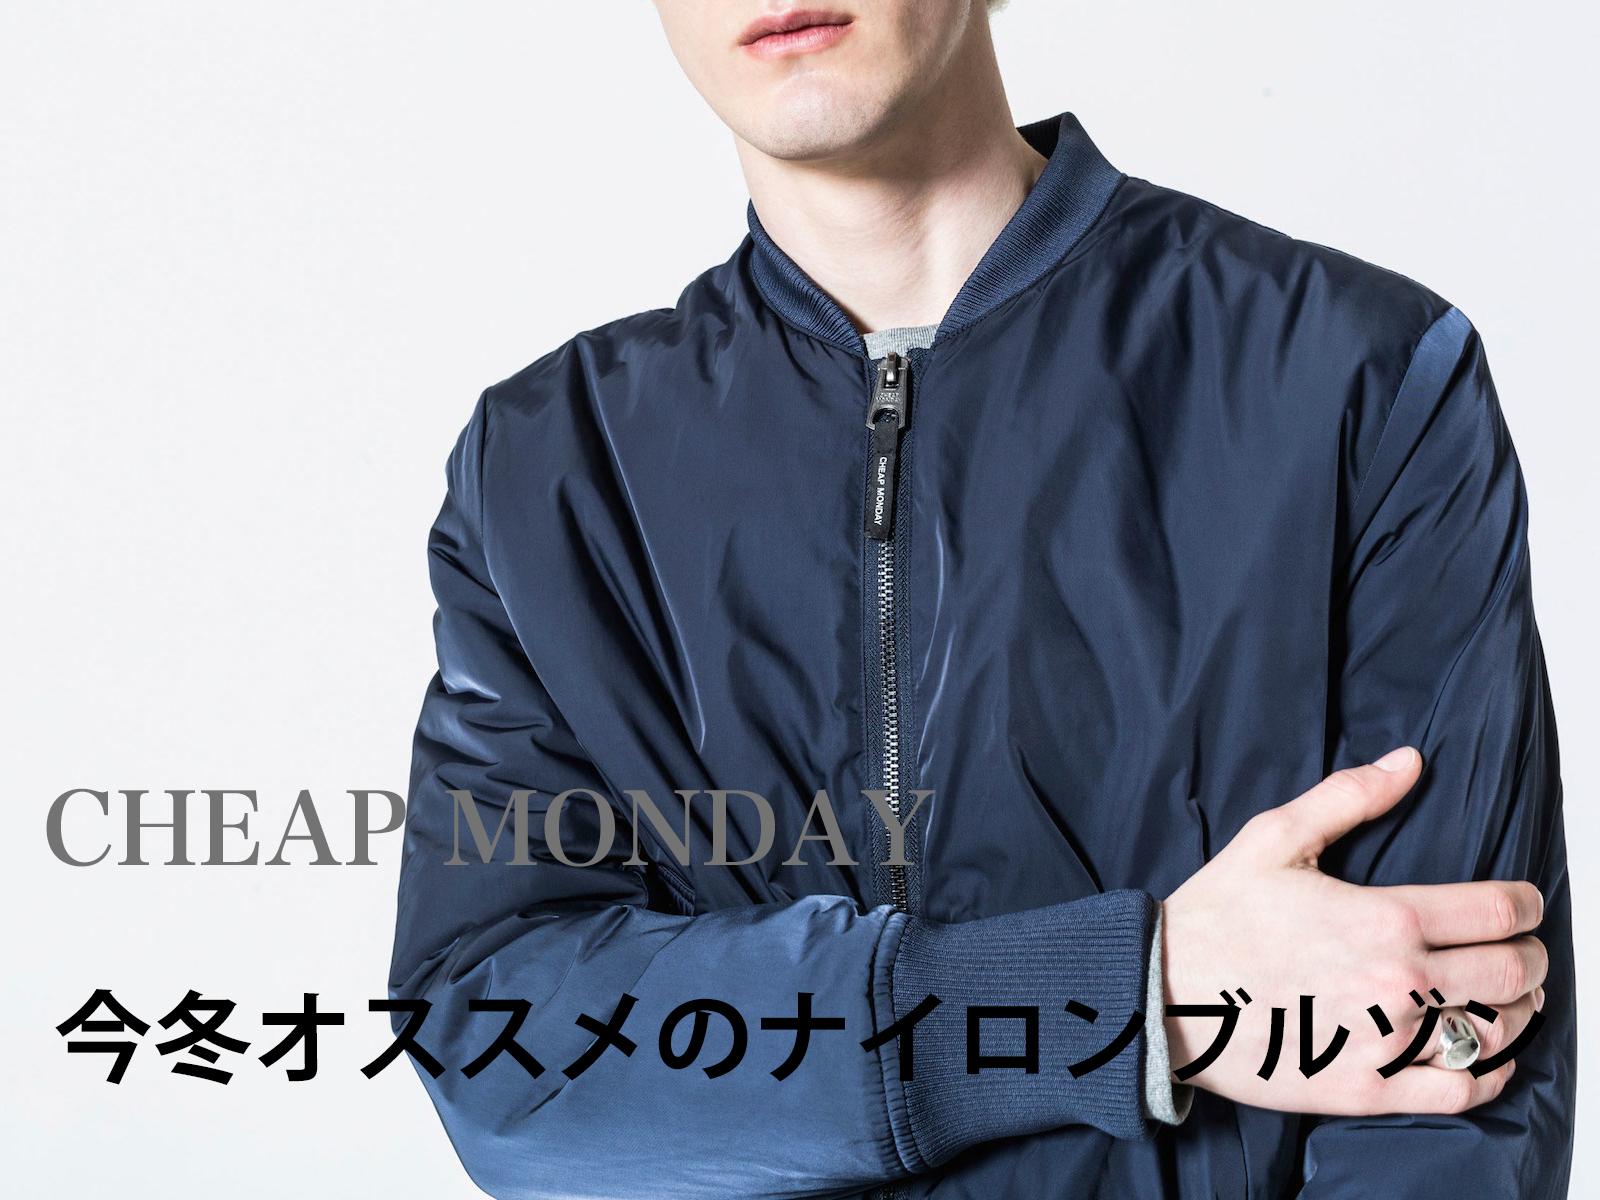 CHEAP MONDAY (チープ・マンデー) / 今冬オススメのナイロンブルゾン